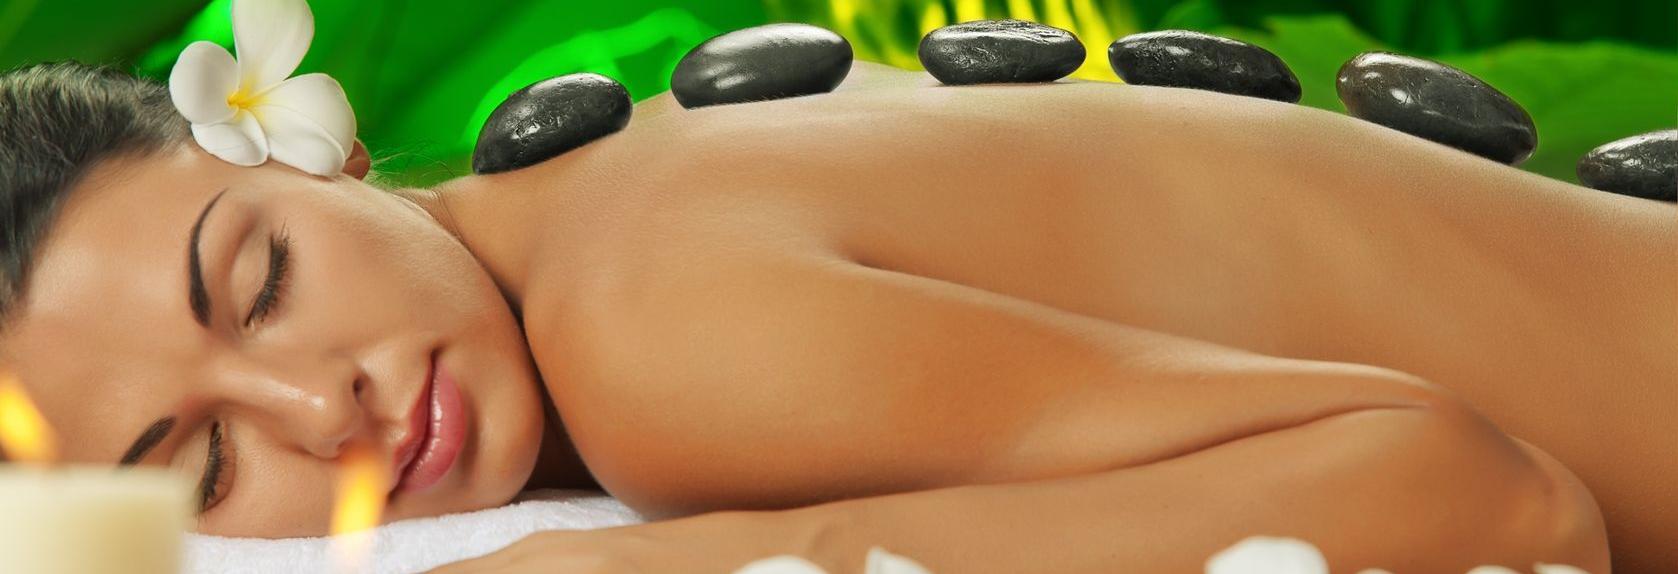 esoe massage elm grove wi banner